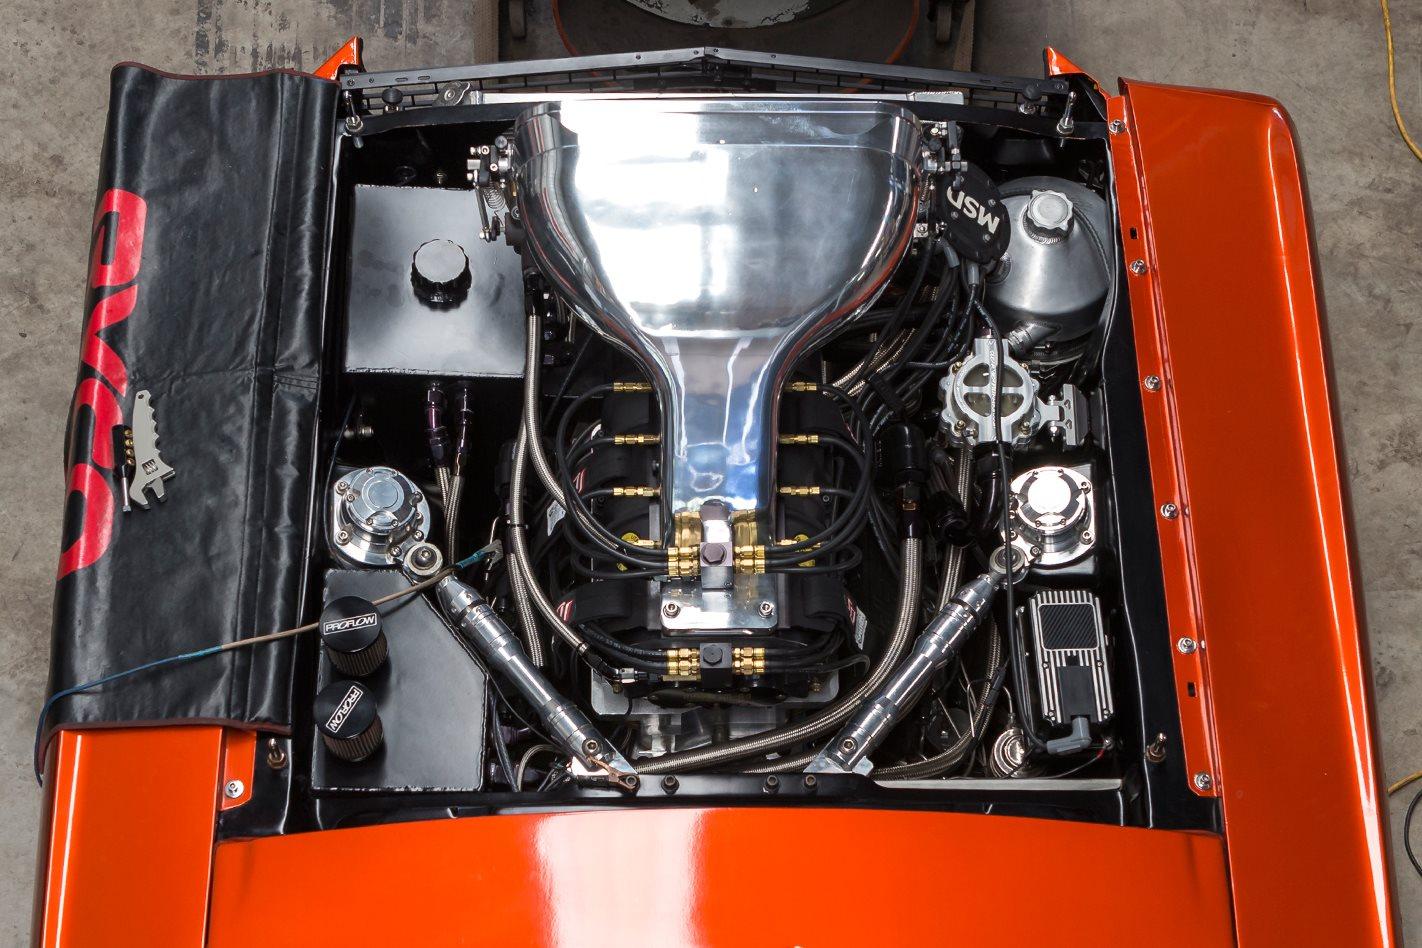 Sicko Mustang engine bay